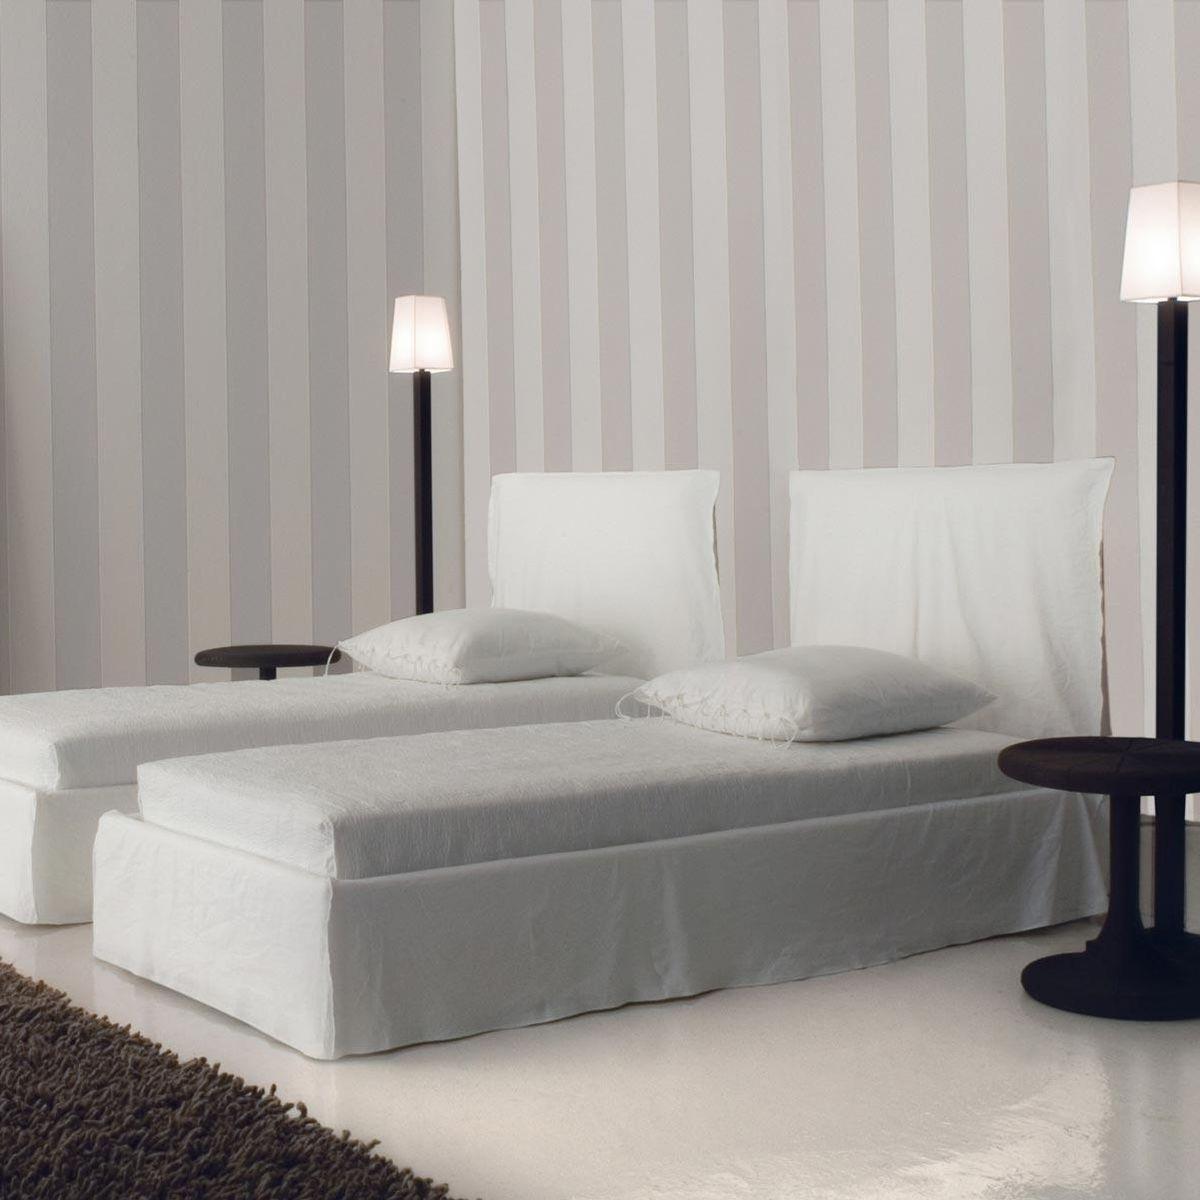 Ghost 80 F Bett mit Husse Bed, Bed furniture, Furniture